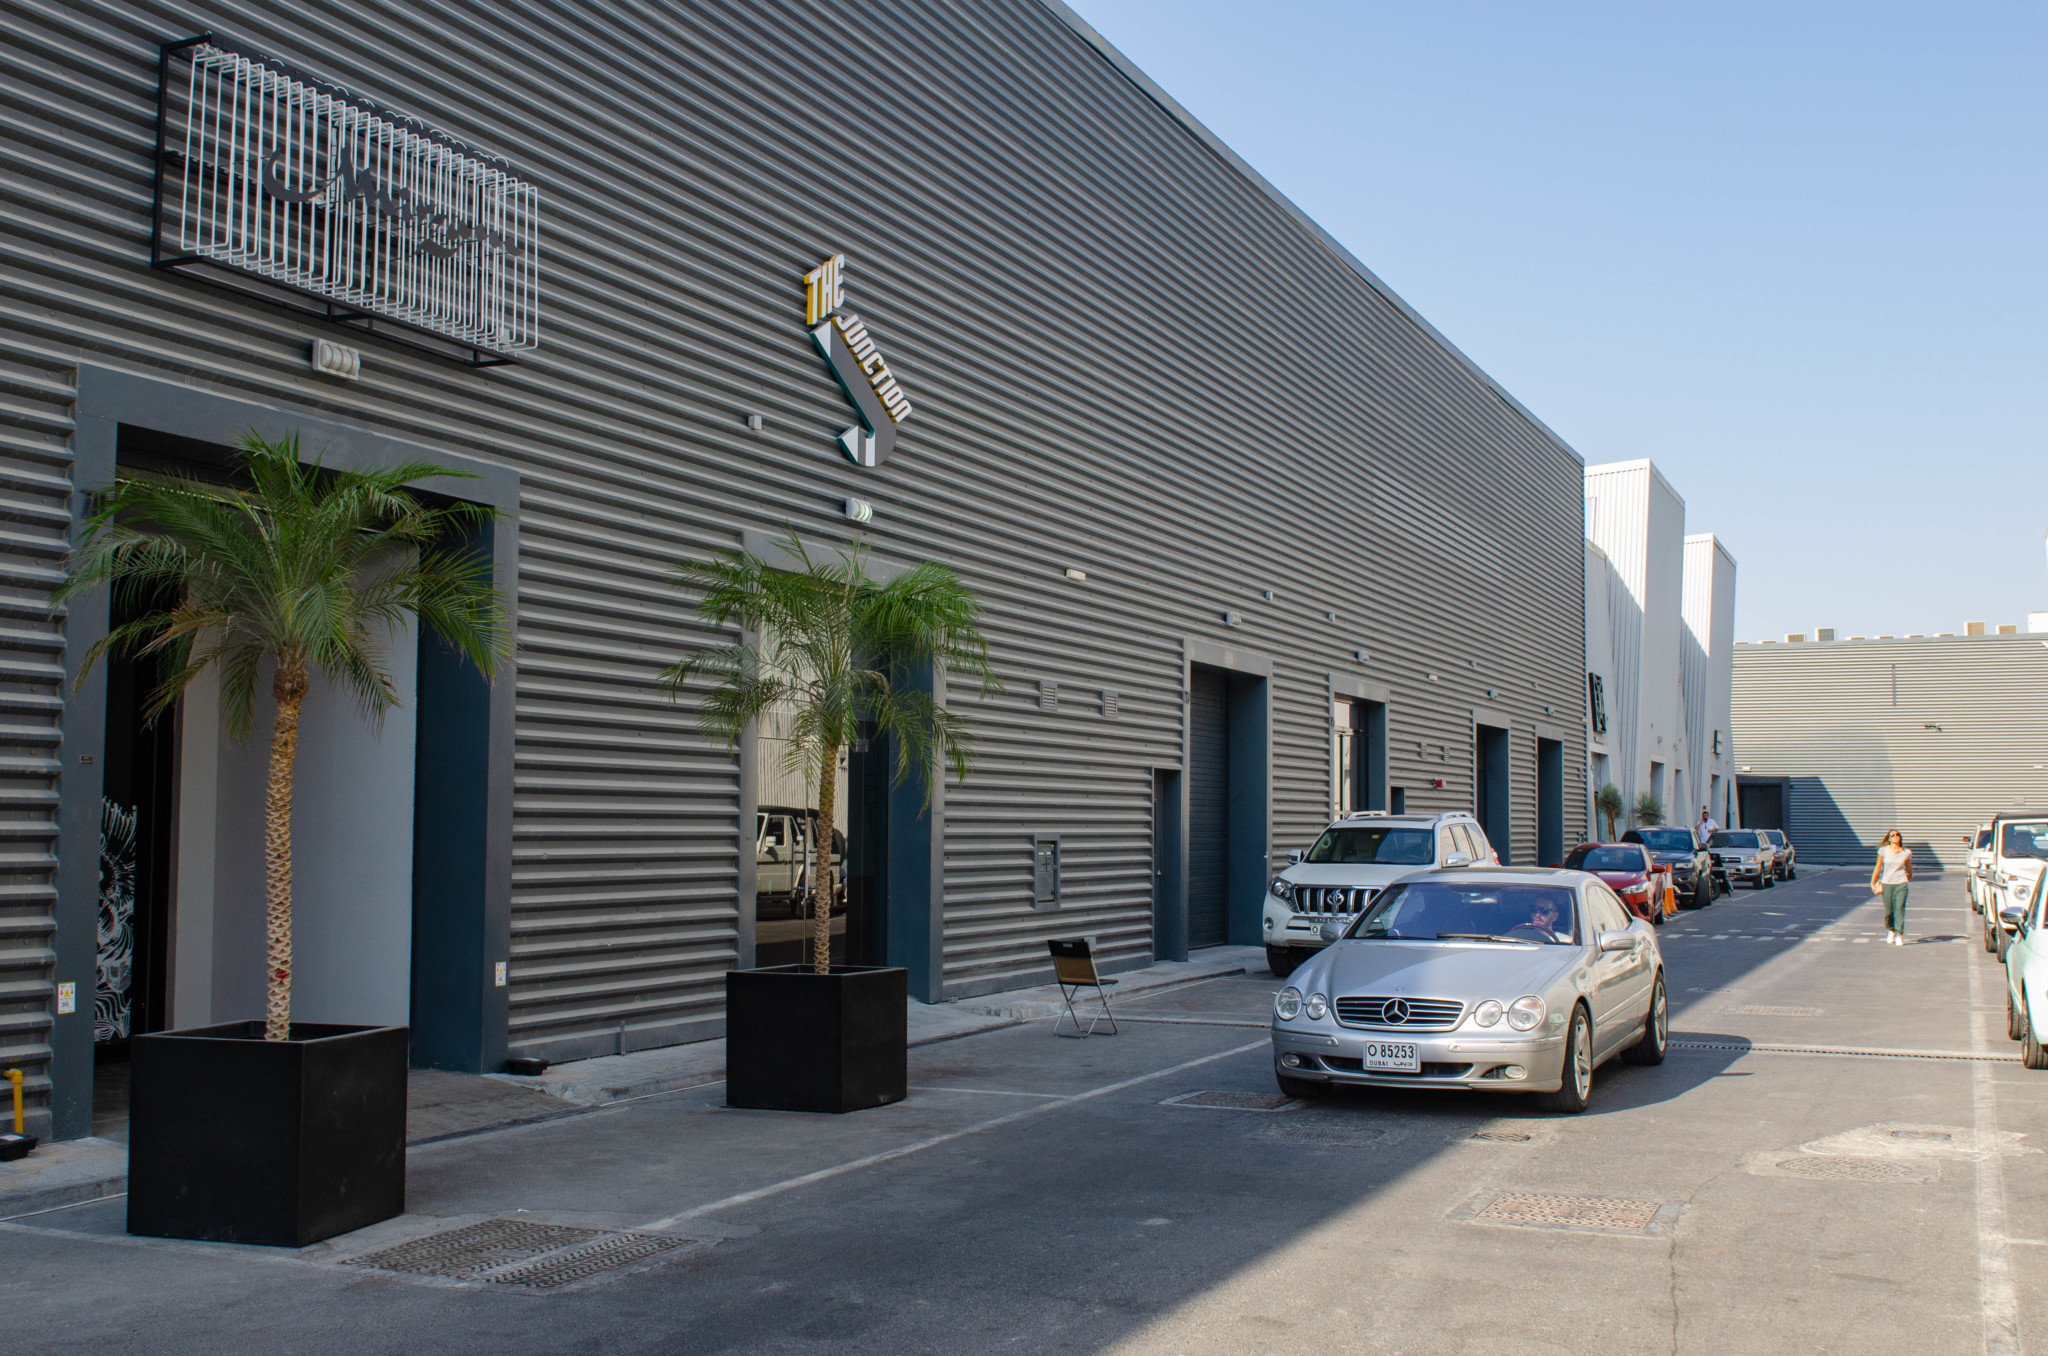 Das Kunstareal der Alserkal Avenue in Dubai